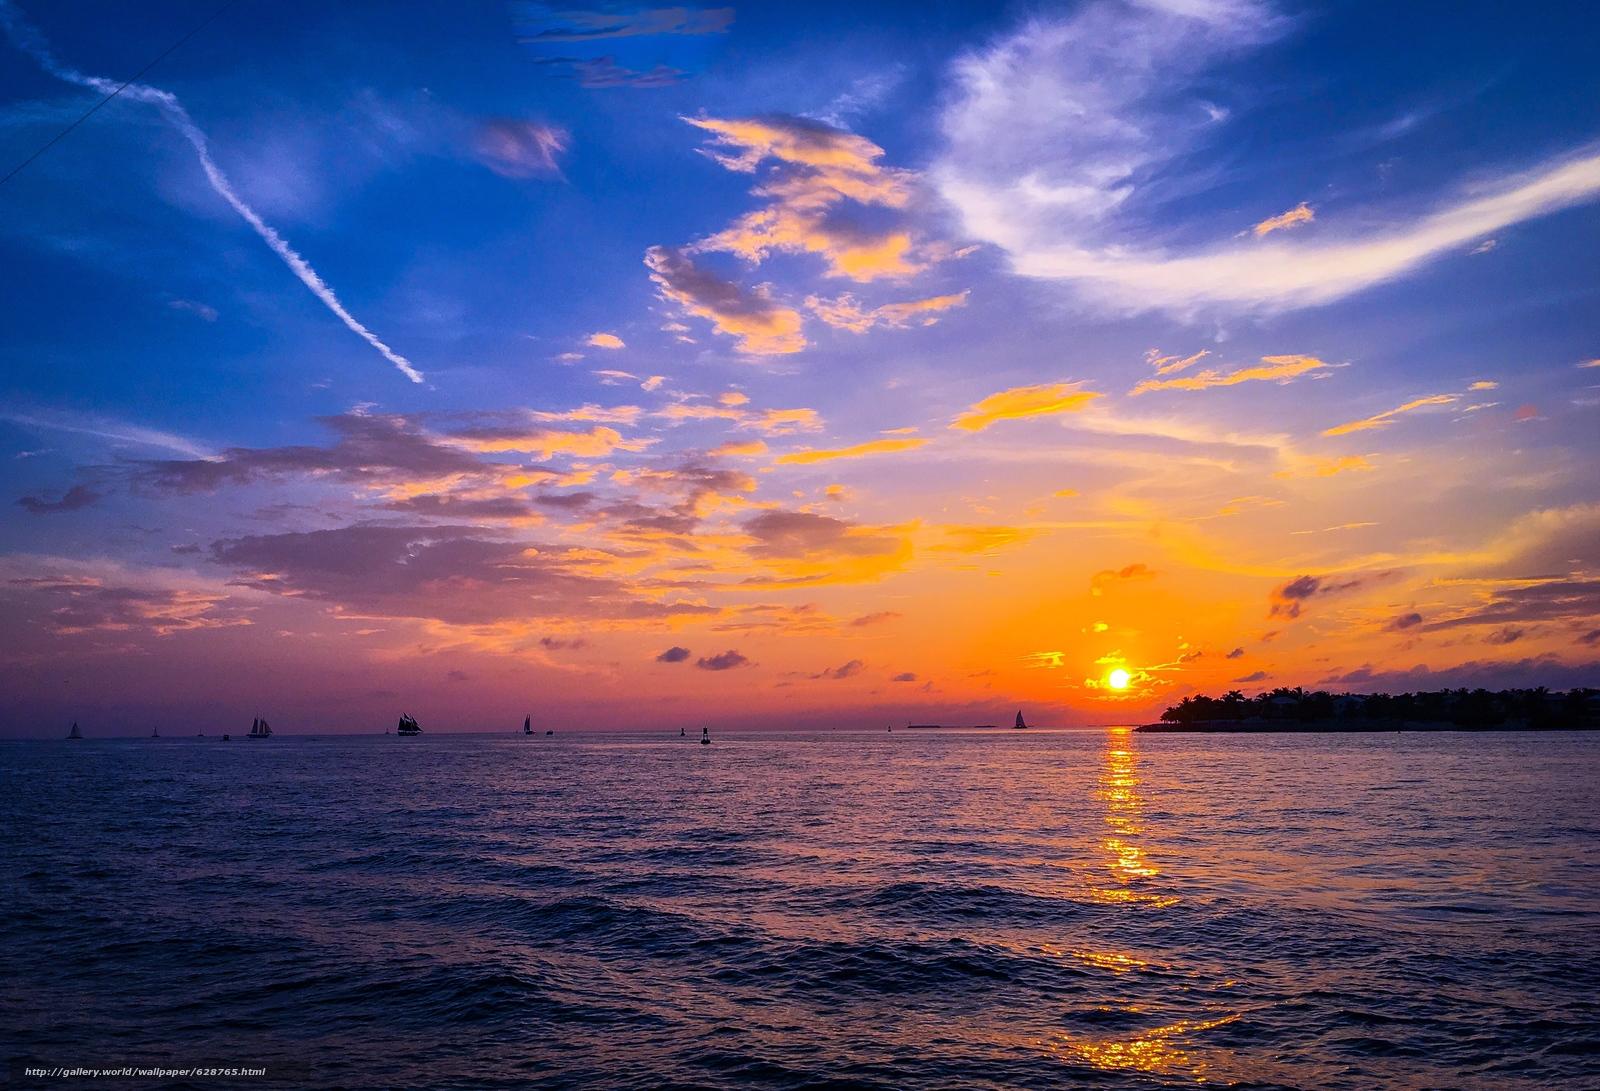 парусники, пейзаж, море, закат